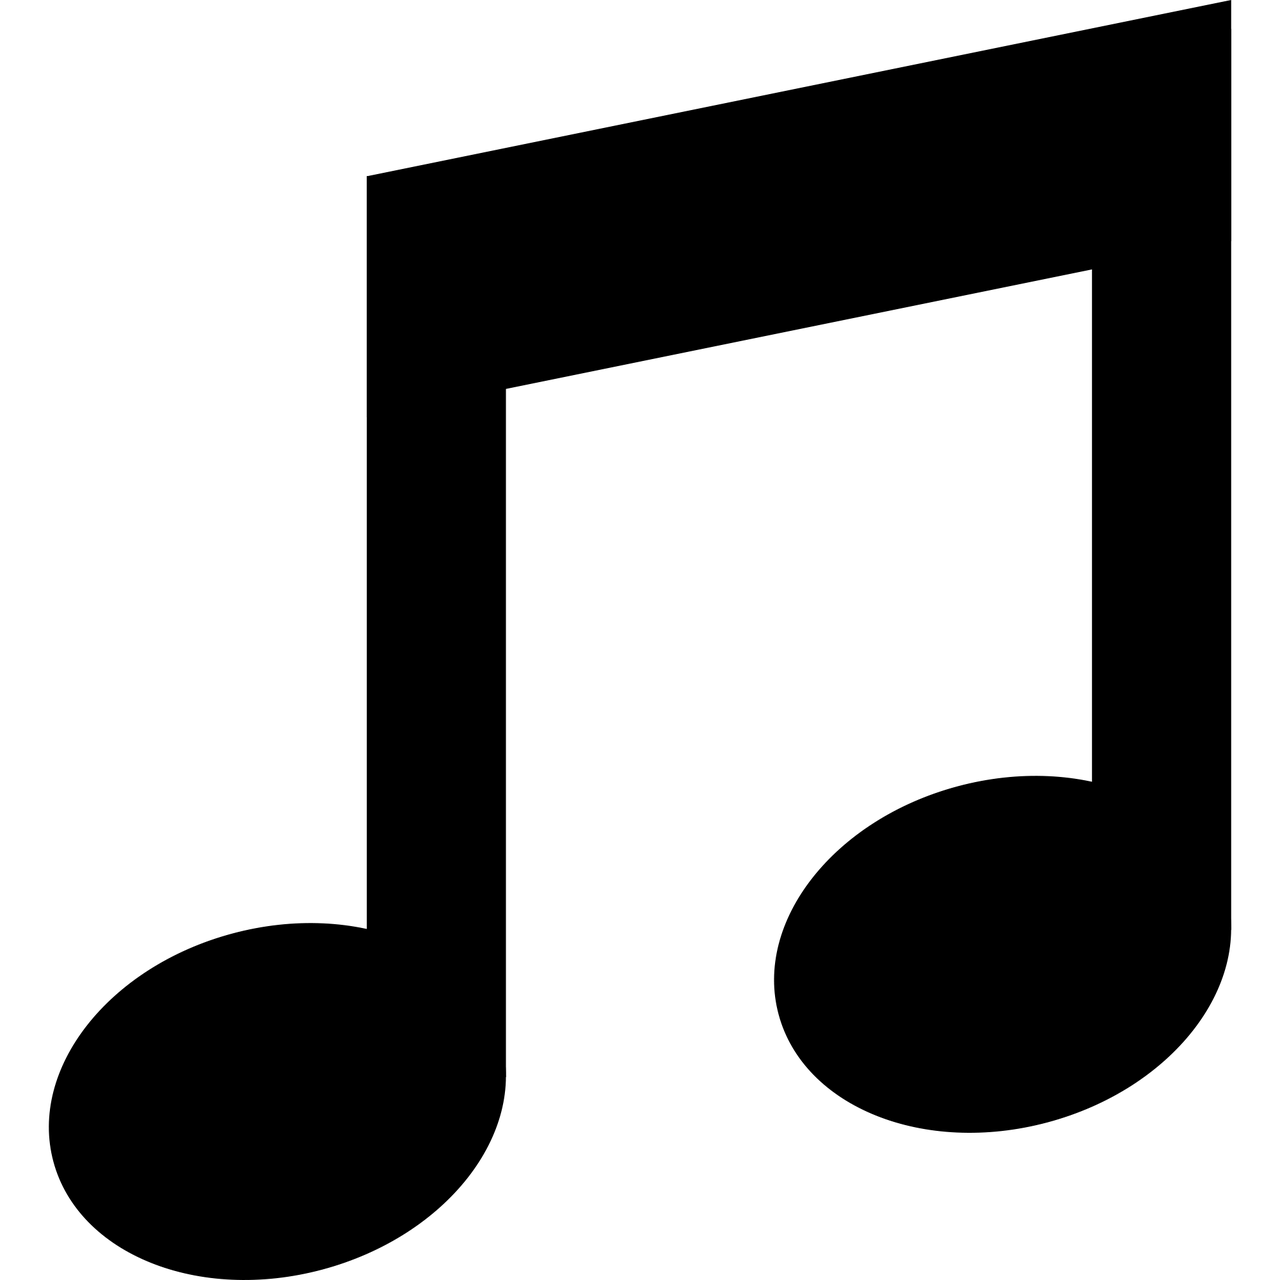 Image result for music note font symbol